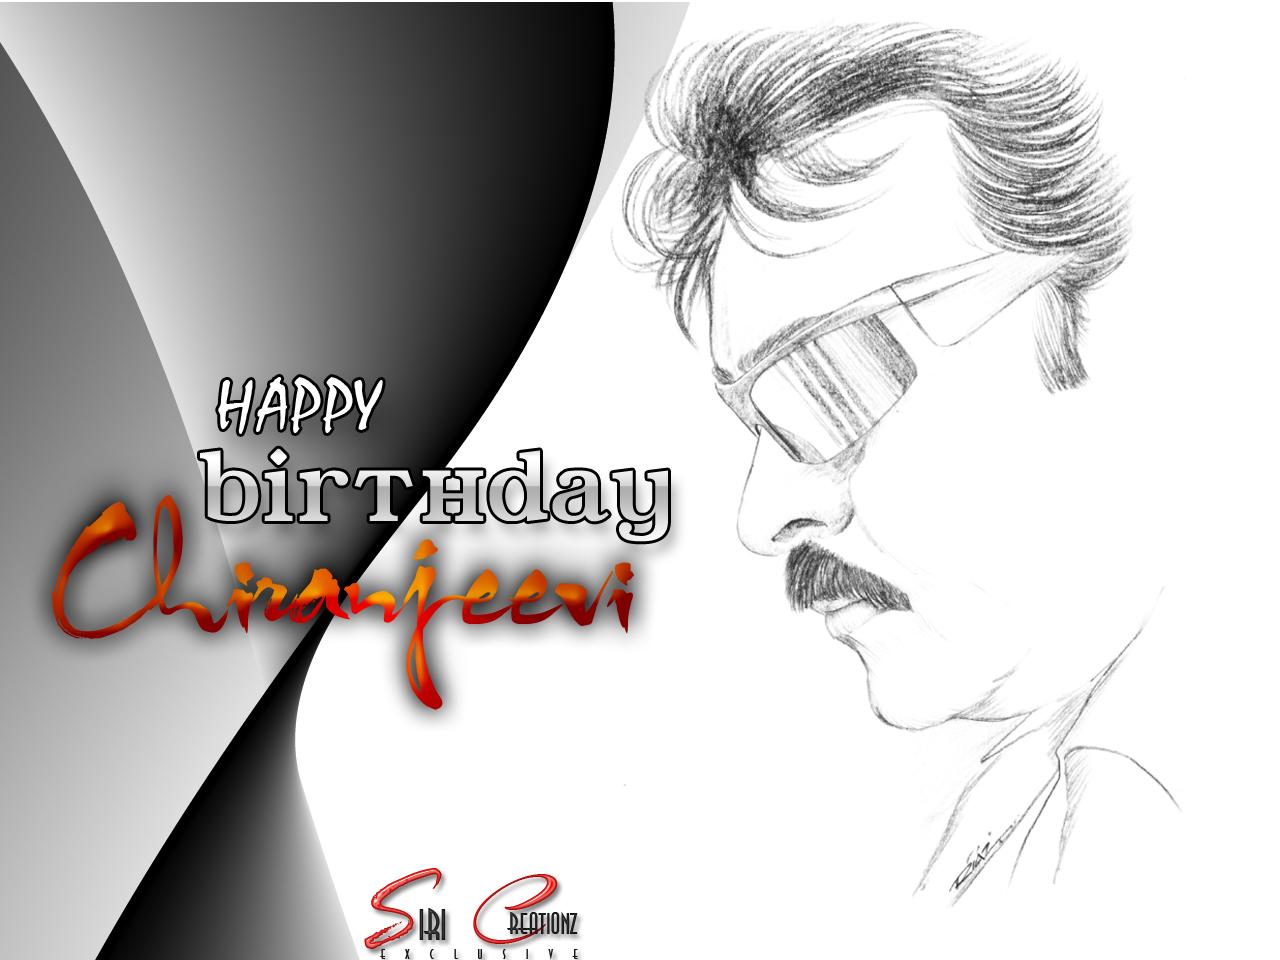 http://3.bp.blogspot.com/-0BIVSy3Hp0k/TlEs_klgR_I/AAAAAAAAA78/ttzj36-w1To/s1600/Megastar+Chiranjeevi+Happy+Birthday+Wallpapers+2011+%25289%2529.jpg